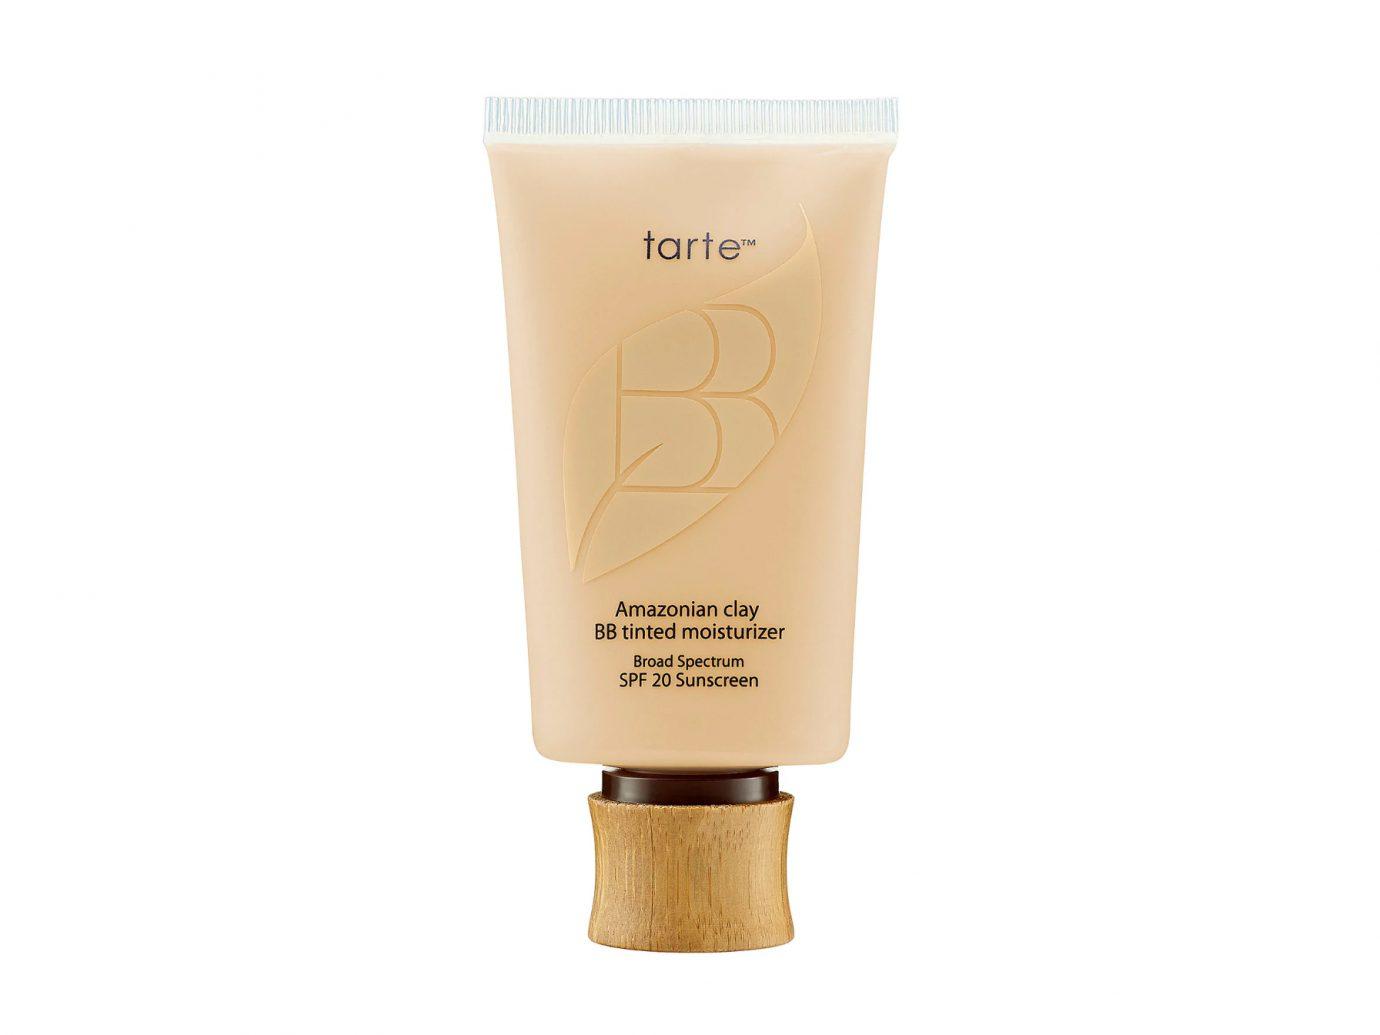 Summer Glow product Tarte BB Tinted Moisturizer